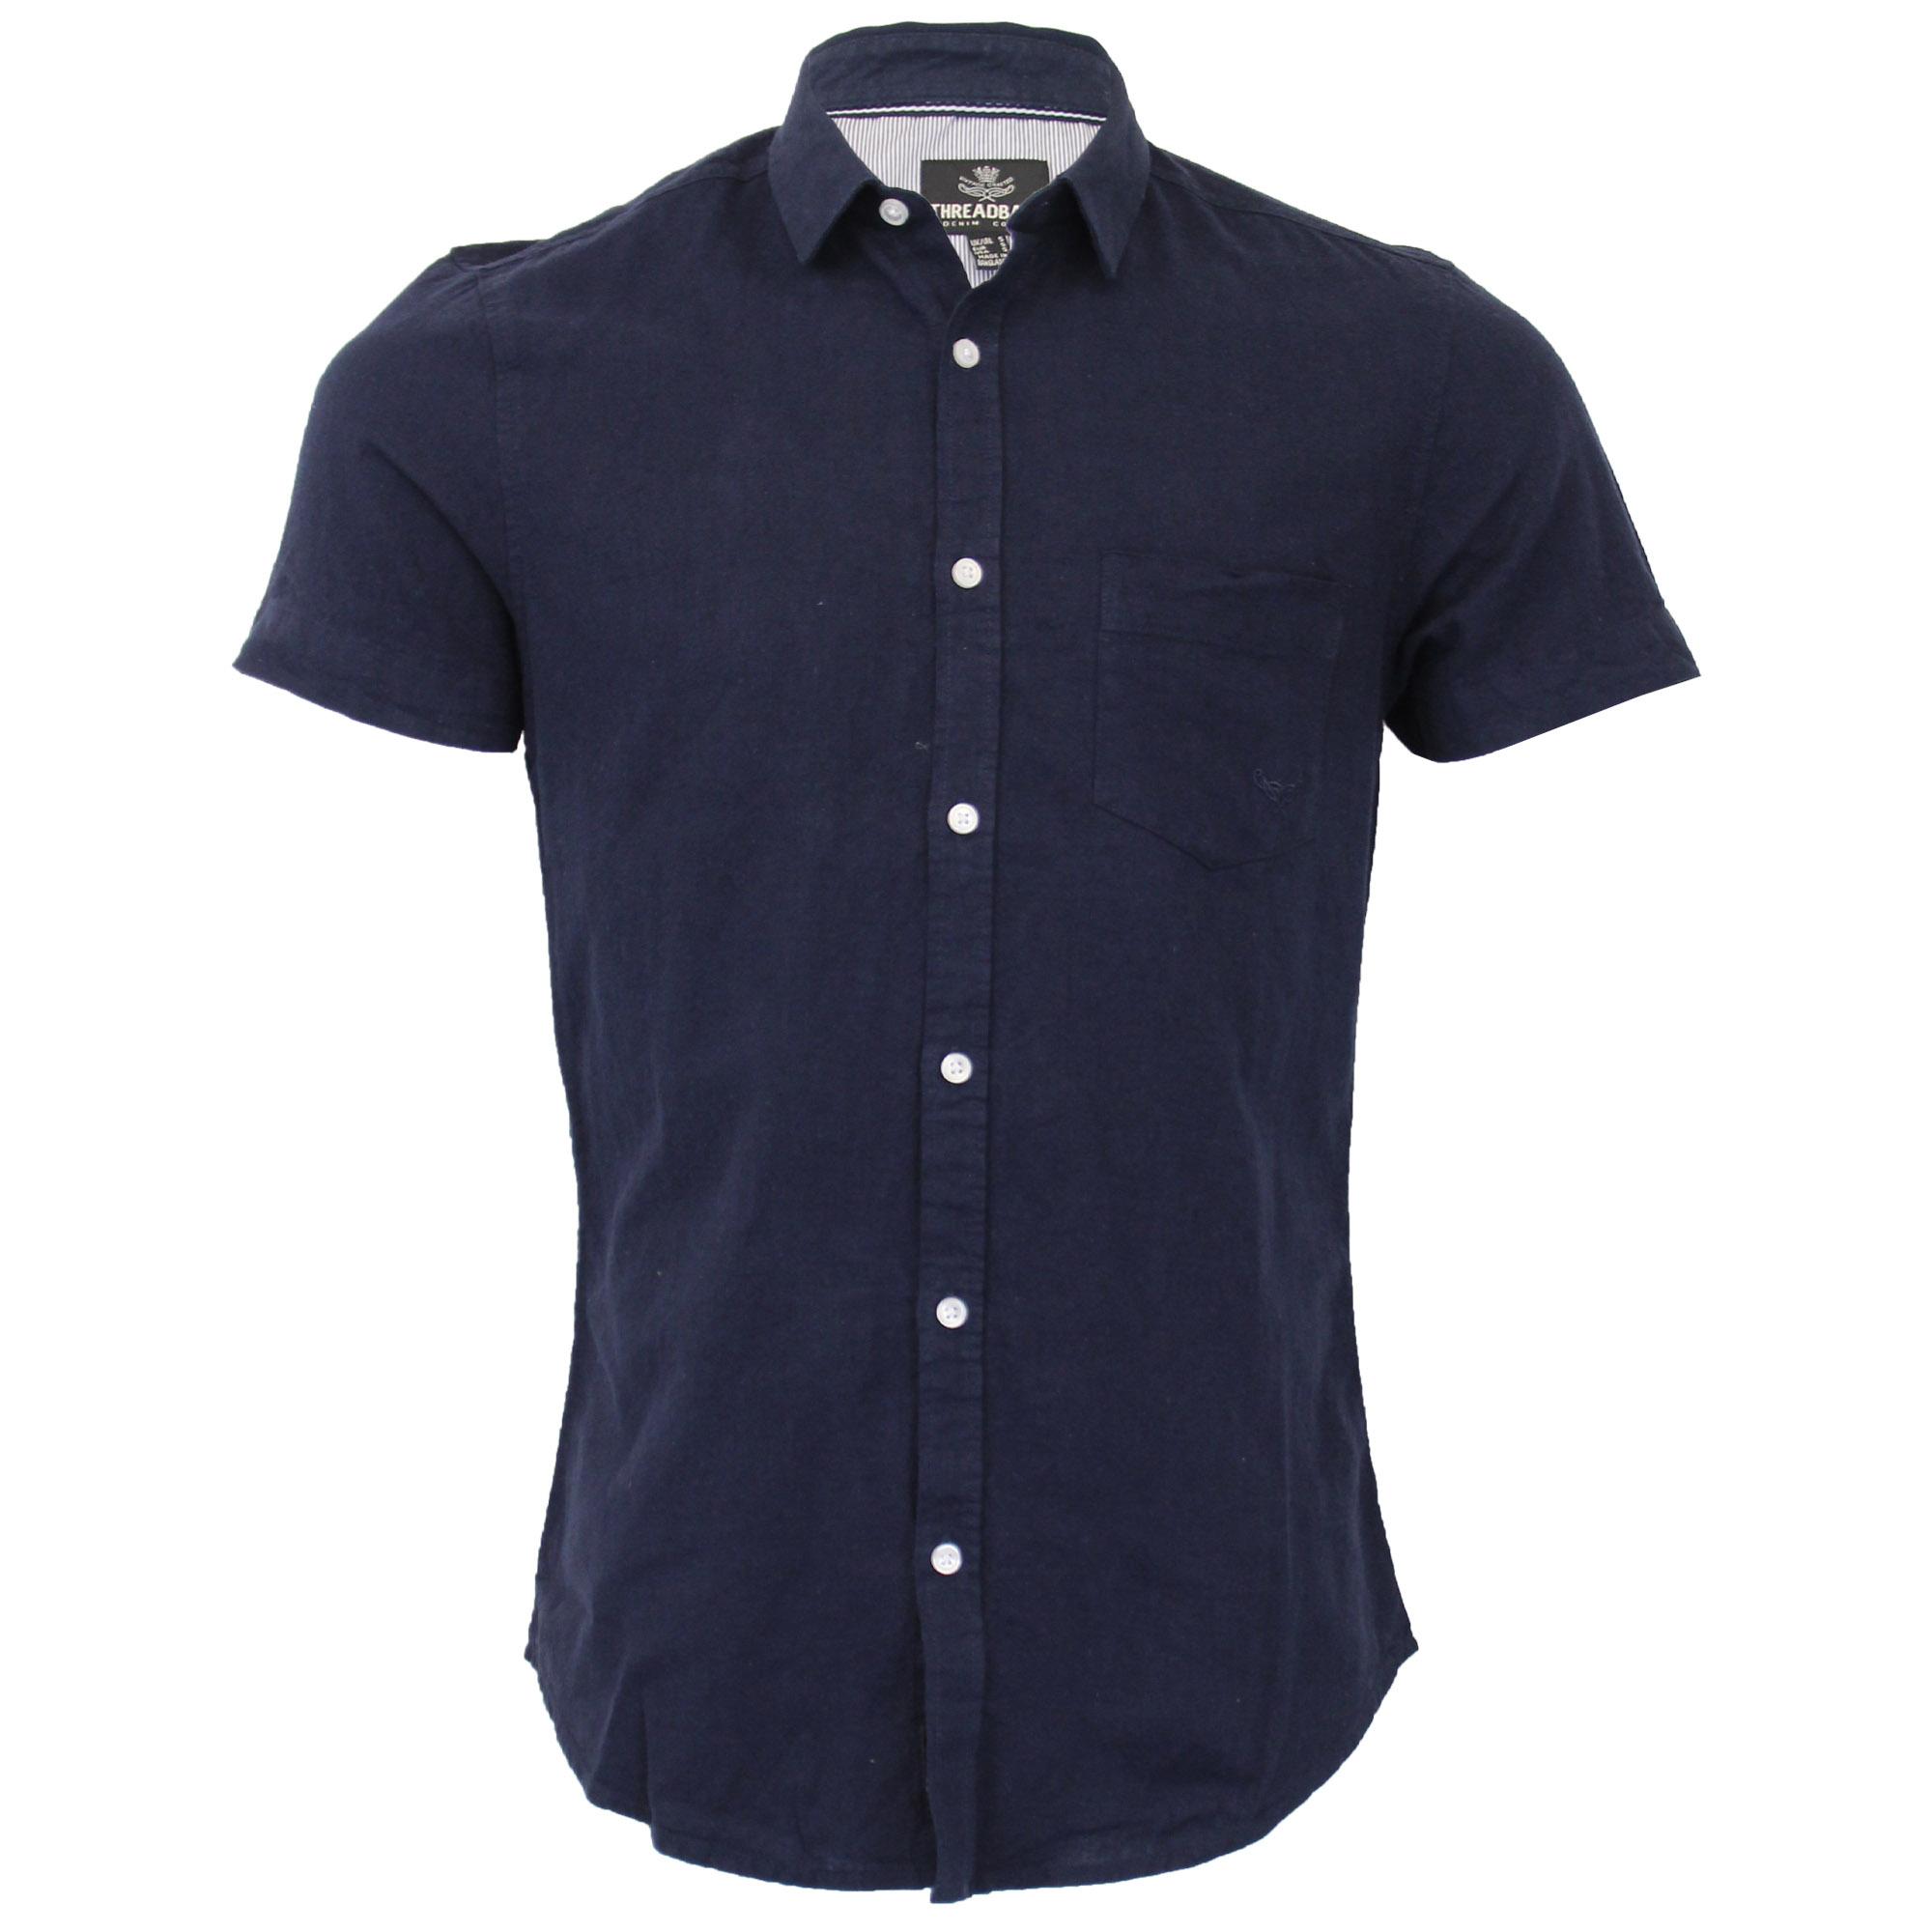 Mens-Linen-Shirt-Threadbare-Short-Sleeved-Brave-Soul-Collared-Casual-Summer-New thumbnail 16